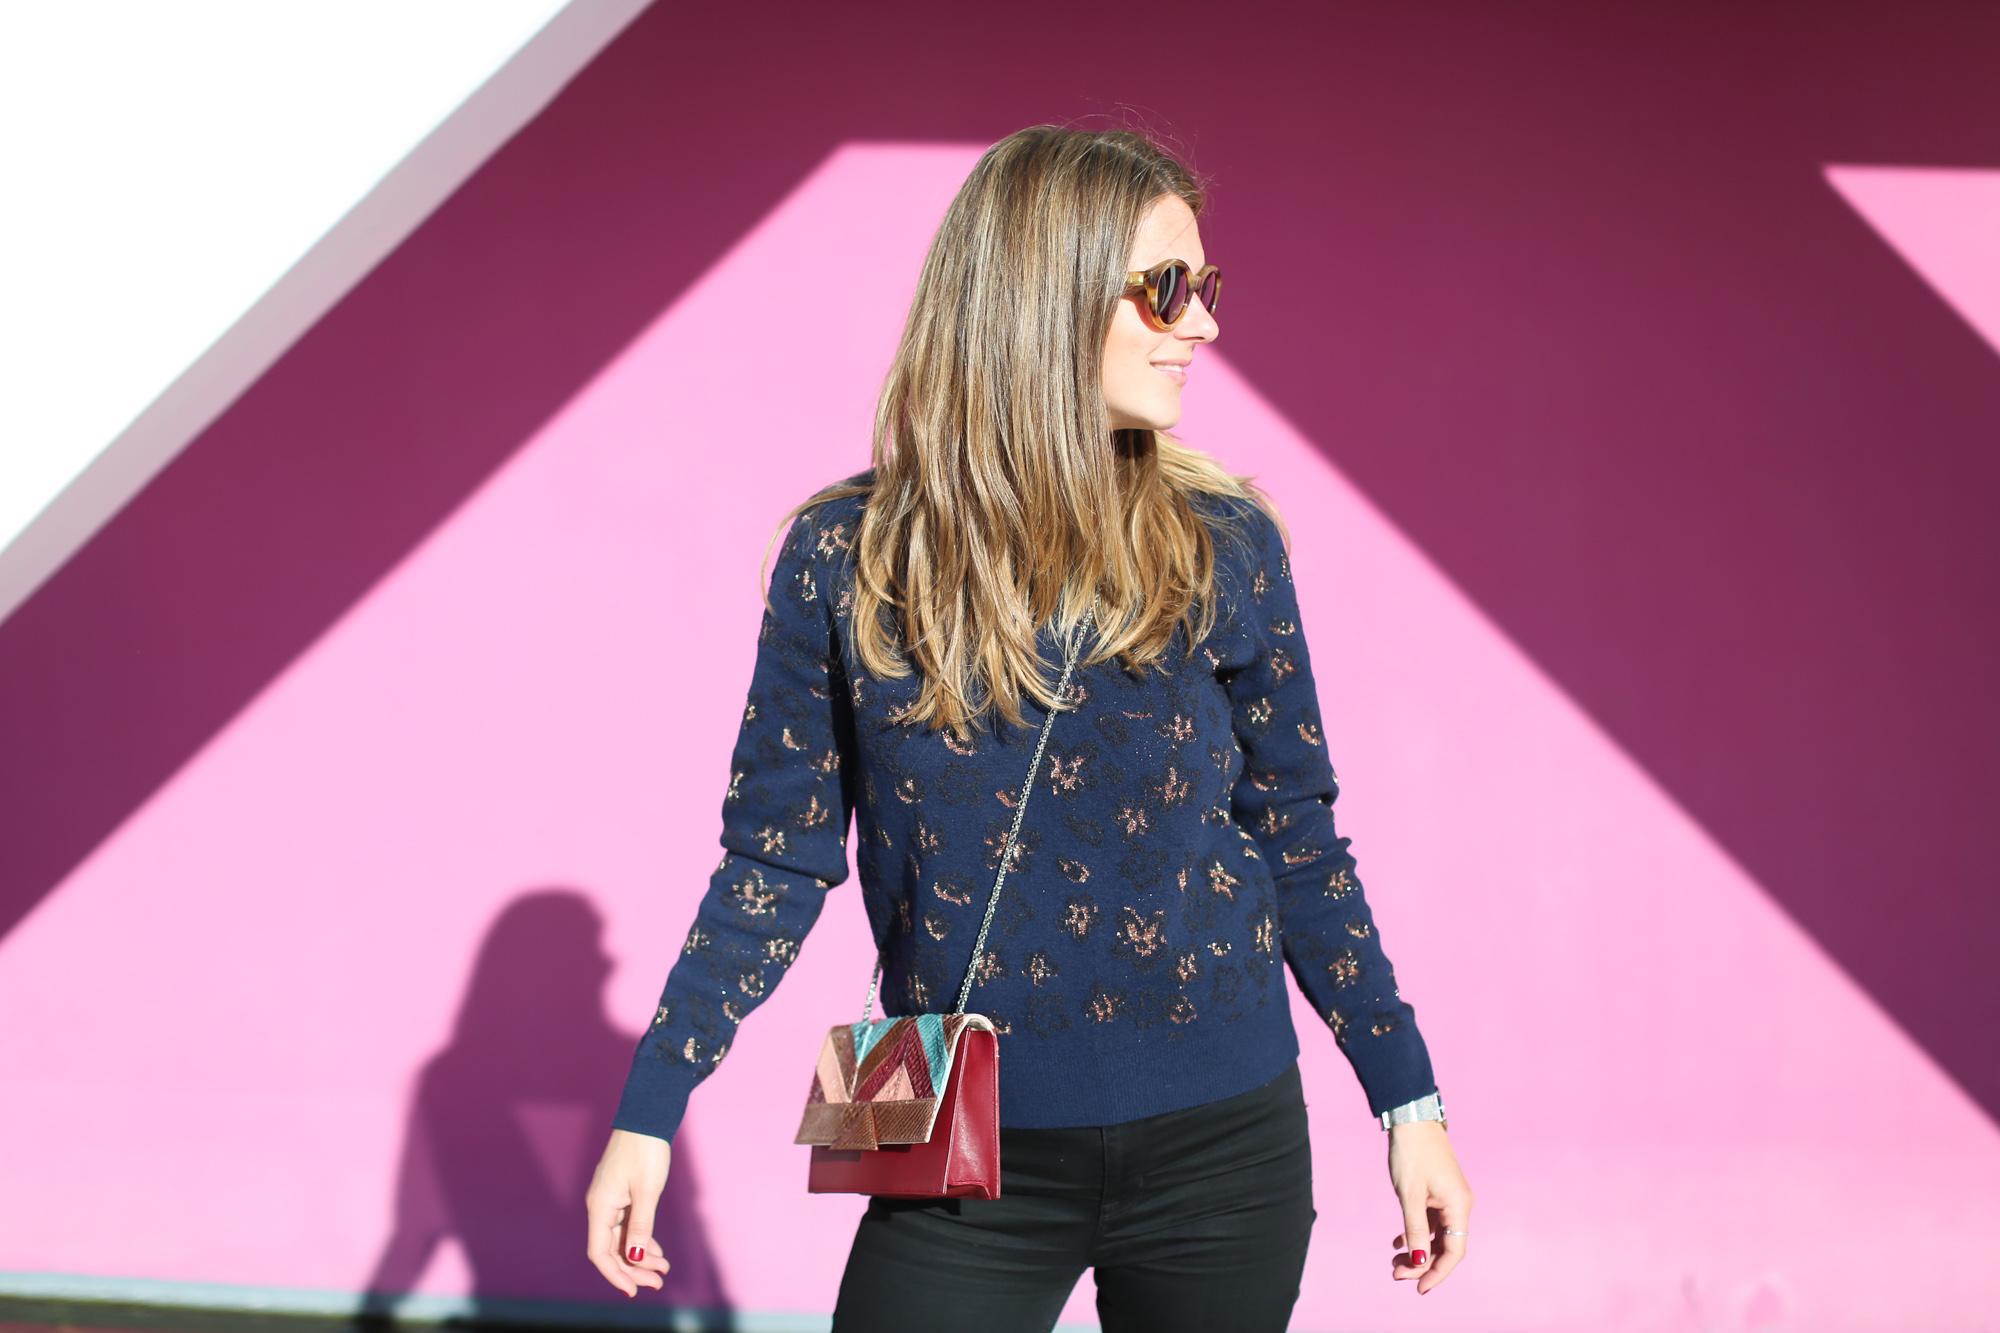 Clochet_fashionblogger_streetstyle_&otherstories_stilettoankleboots_burgundyheroscarf_metallicflowerssweater_titamadridspiga-7